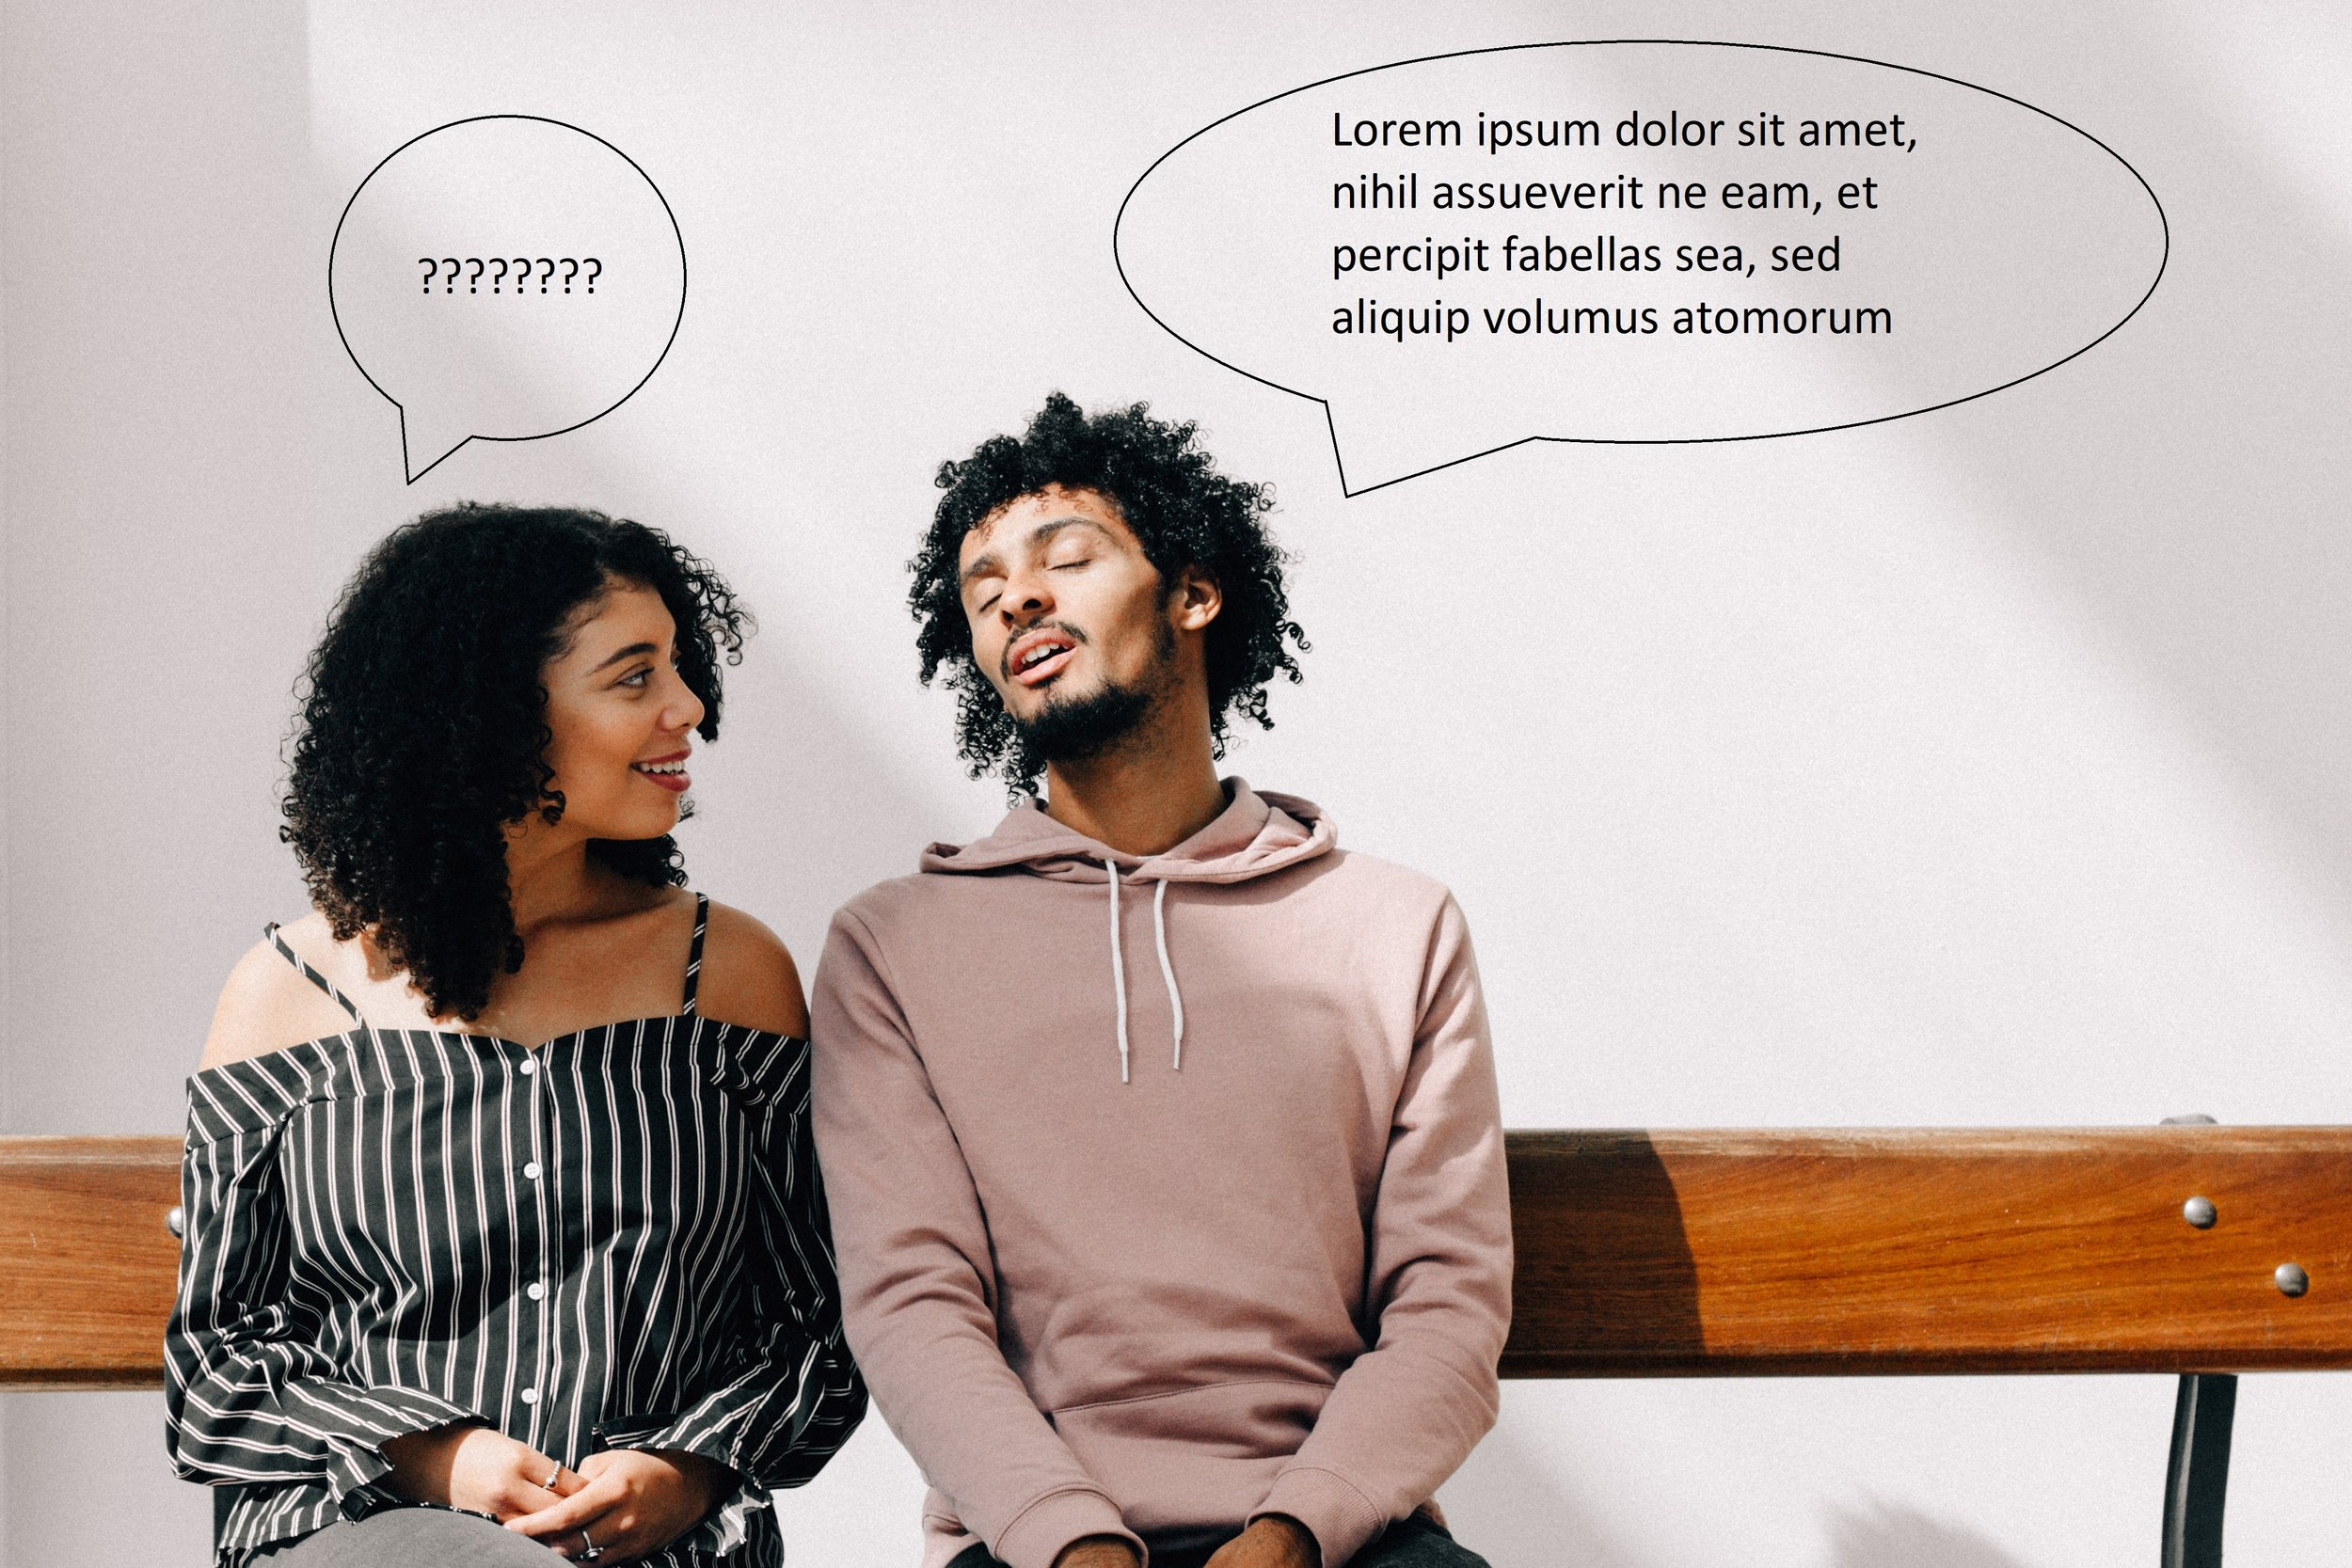 Two people talking v4.jpg